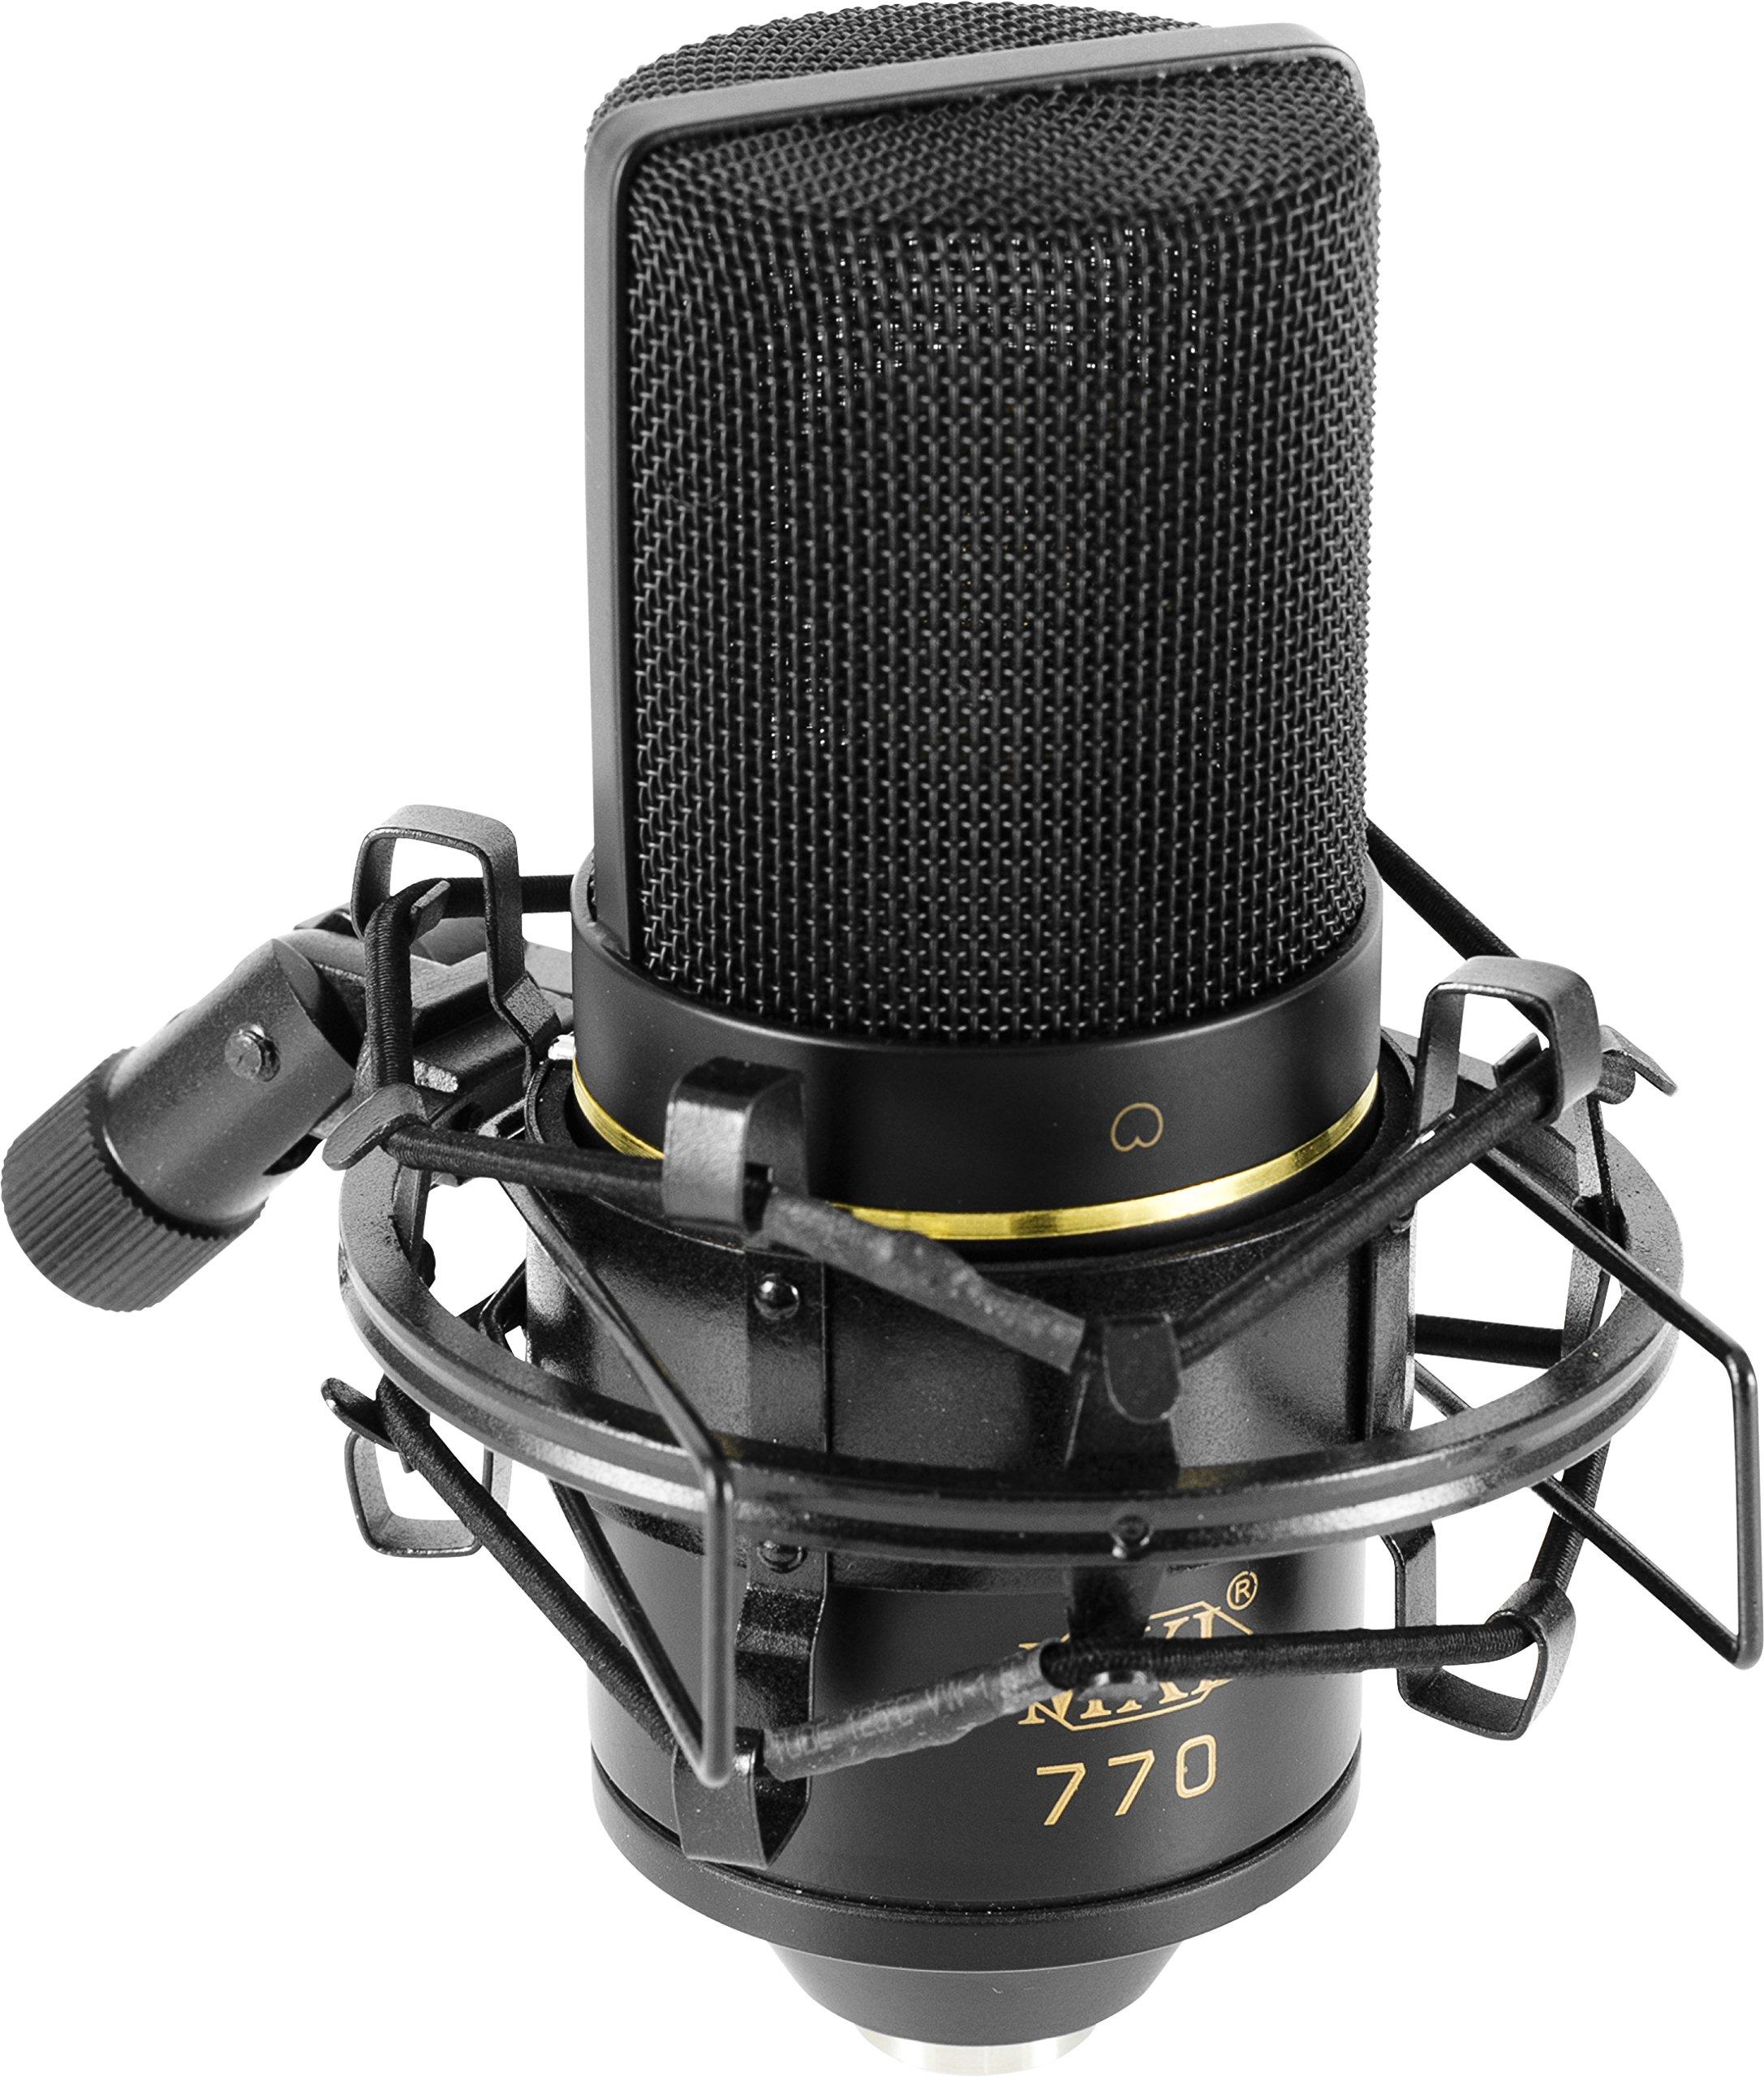 best rated in studio microphones helpful customer reviews. Black Bedroom Furniture Sets. Home Design Ideas